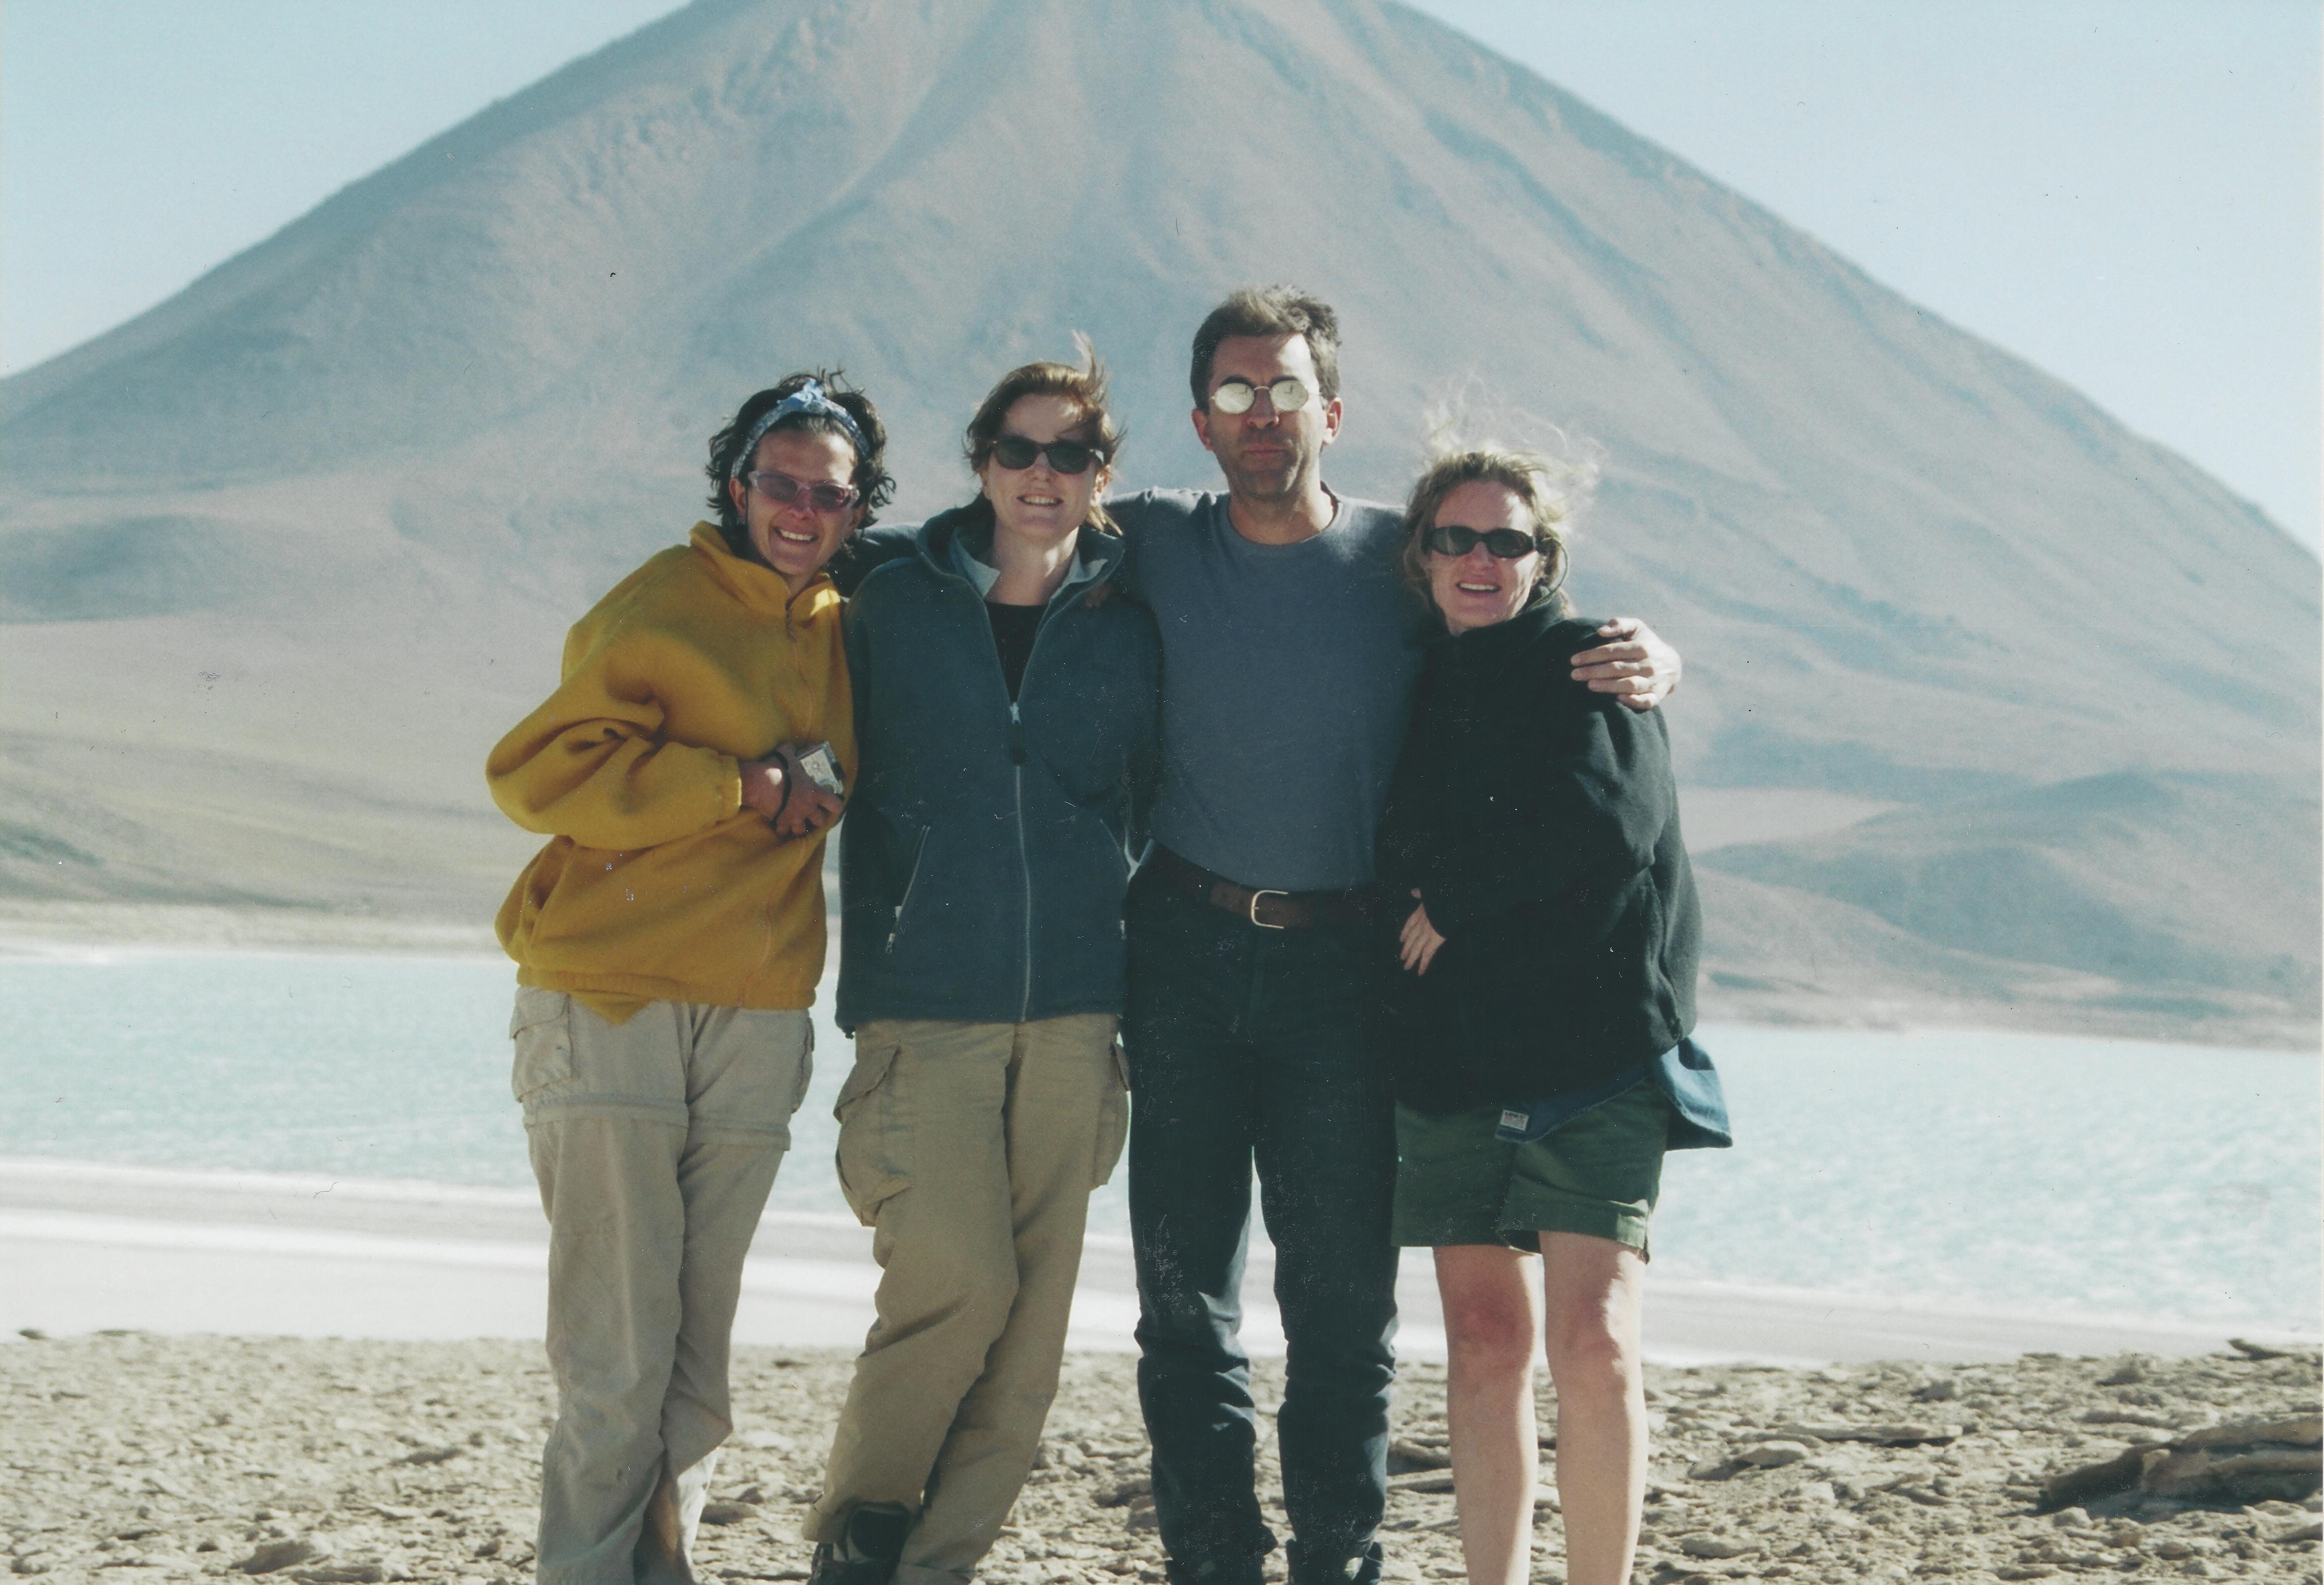 marisol friends travel